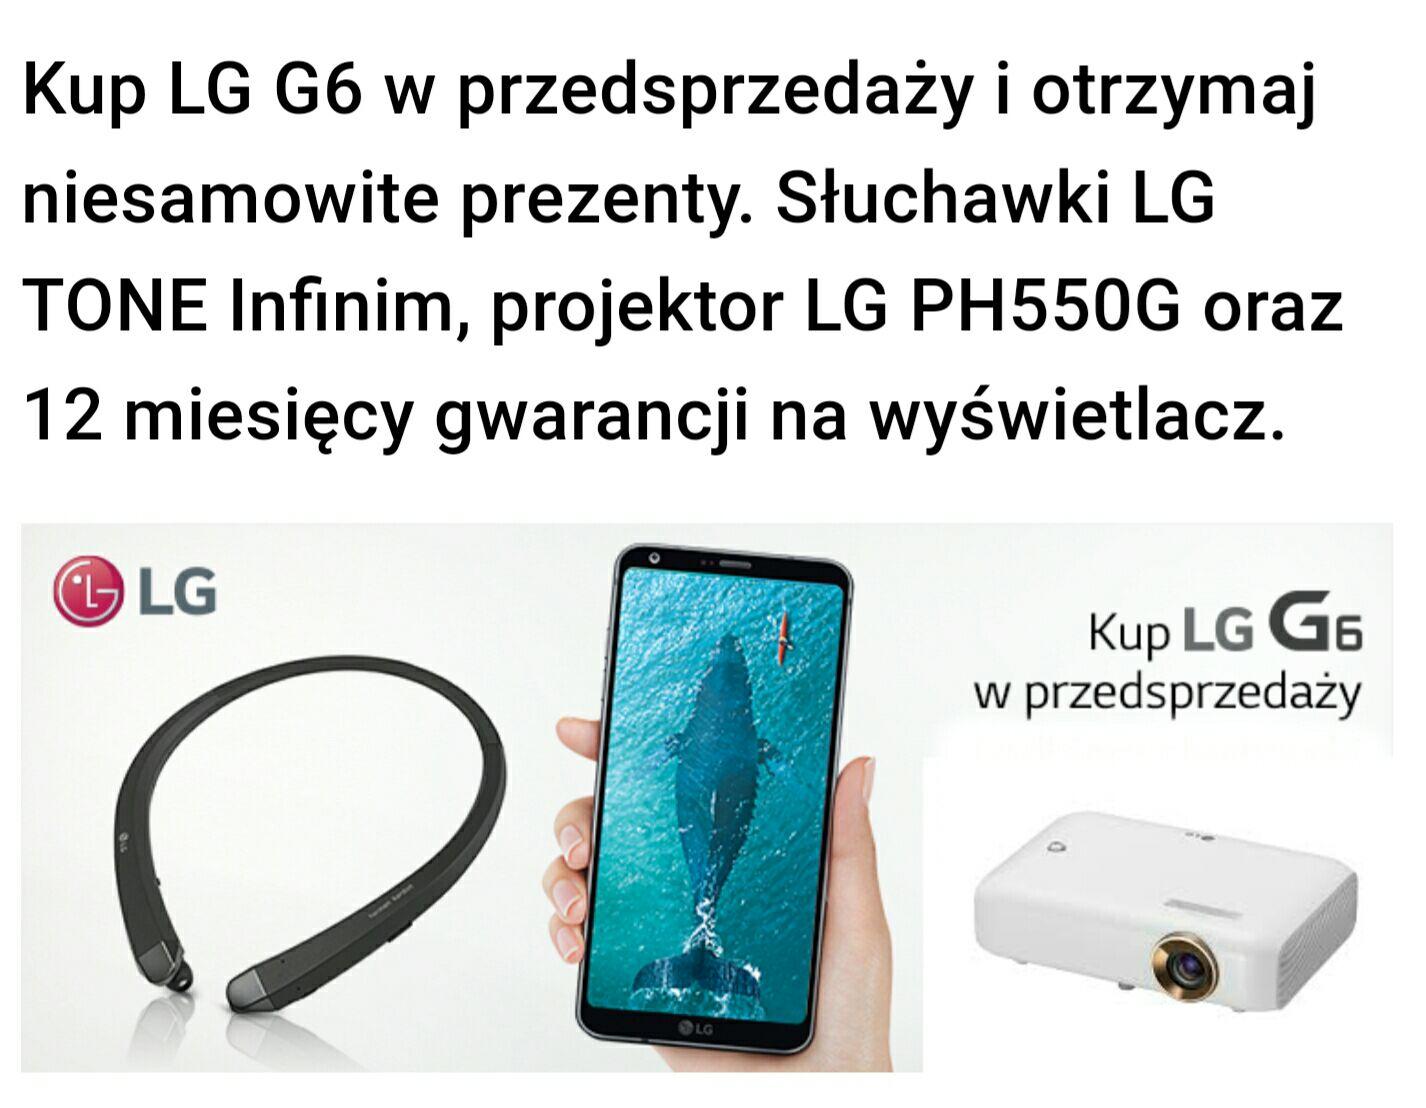 LG G6 + HBS-910 w Play za 1 zł